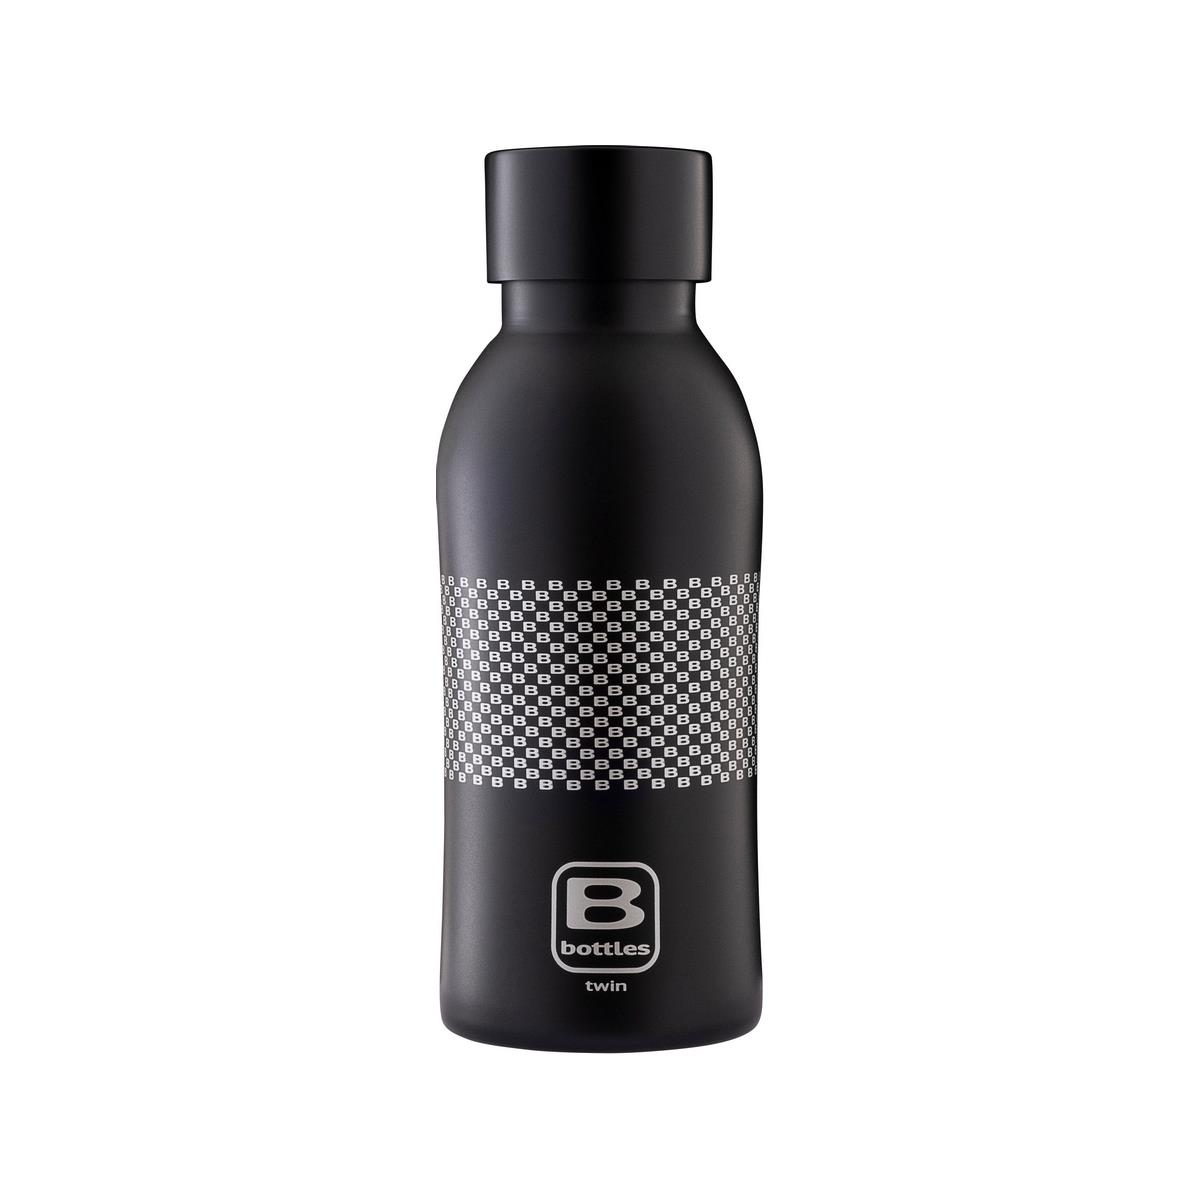 B Bottles Twin - B Pattern - 350 ml - Bottiglia Termica a doppia parete in acciaio inox 18/10